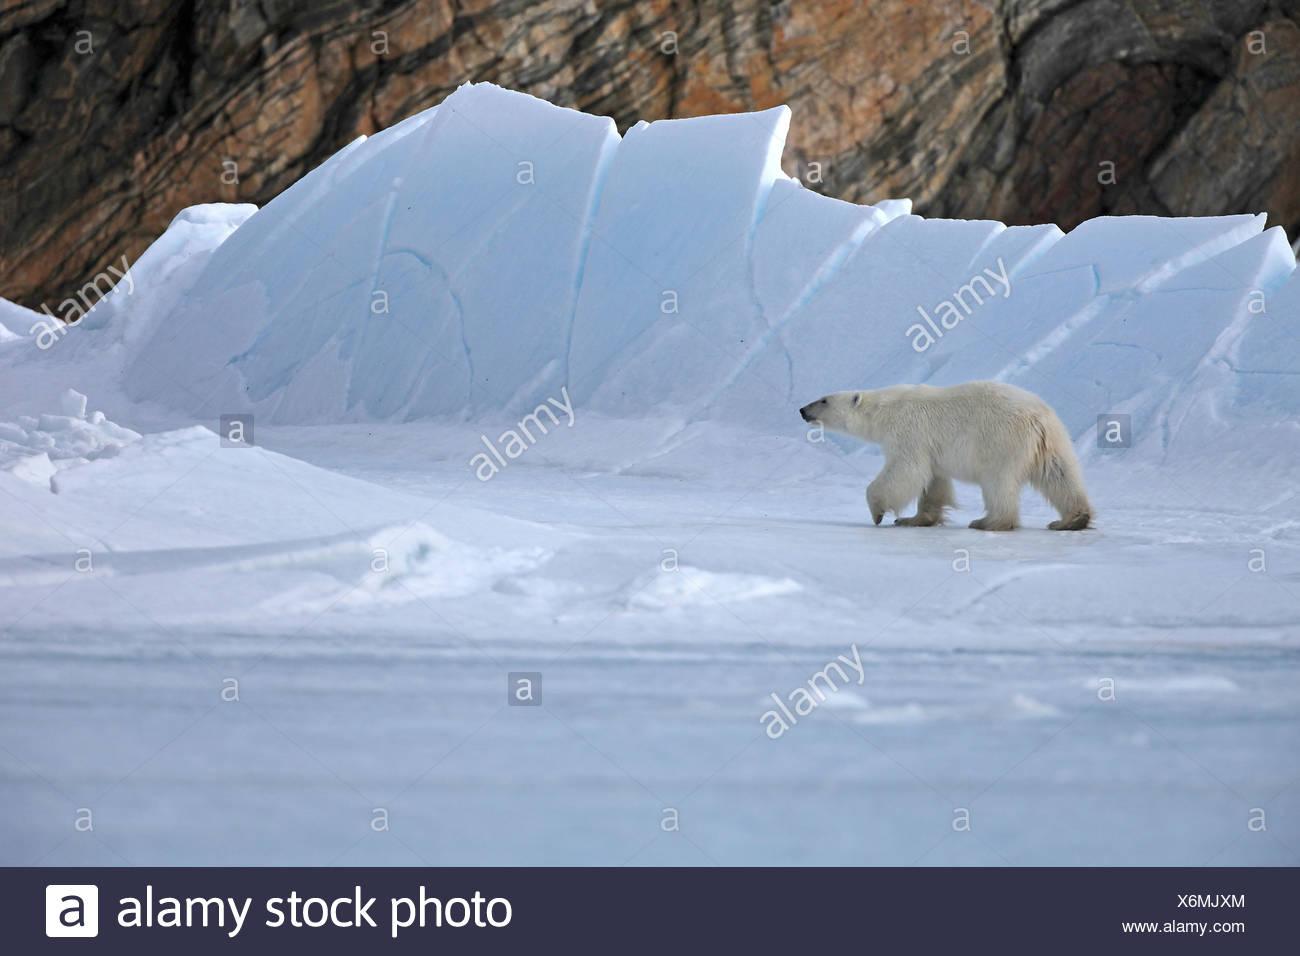 polar bear (Ursus maritimus), walking through arctic landscape, Canada, Nunavut Stock Photo